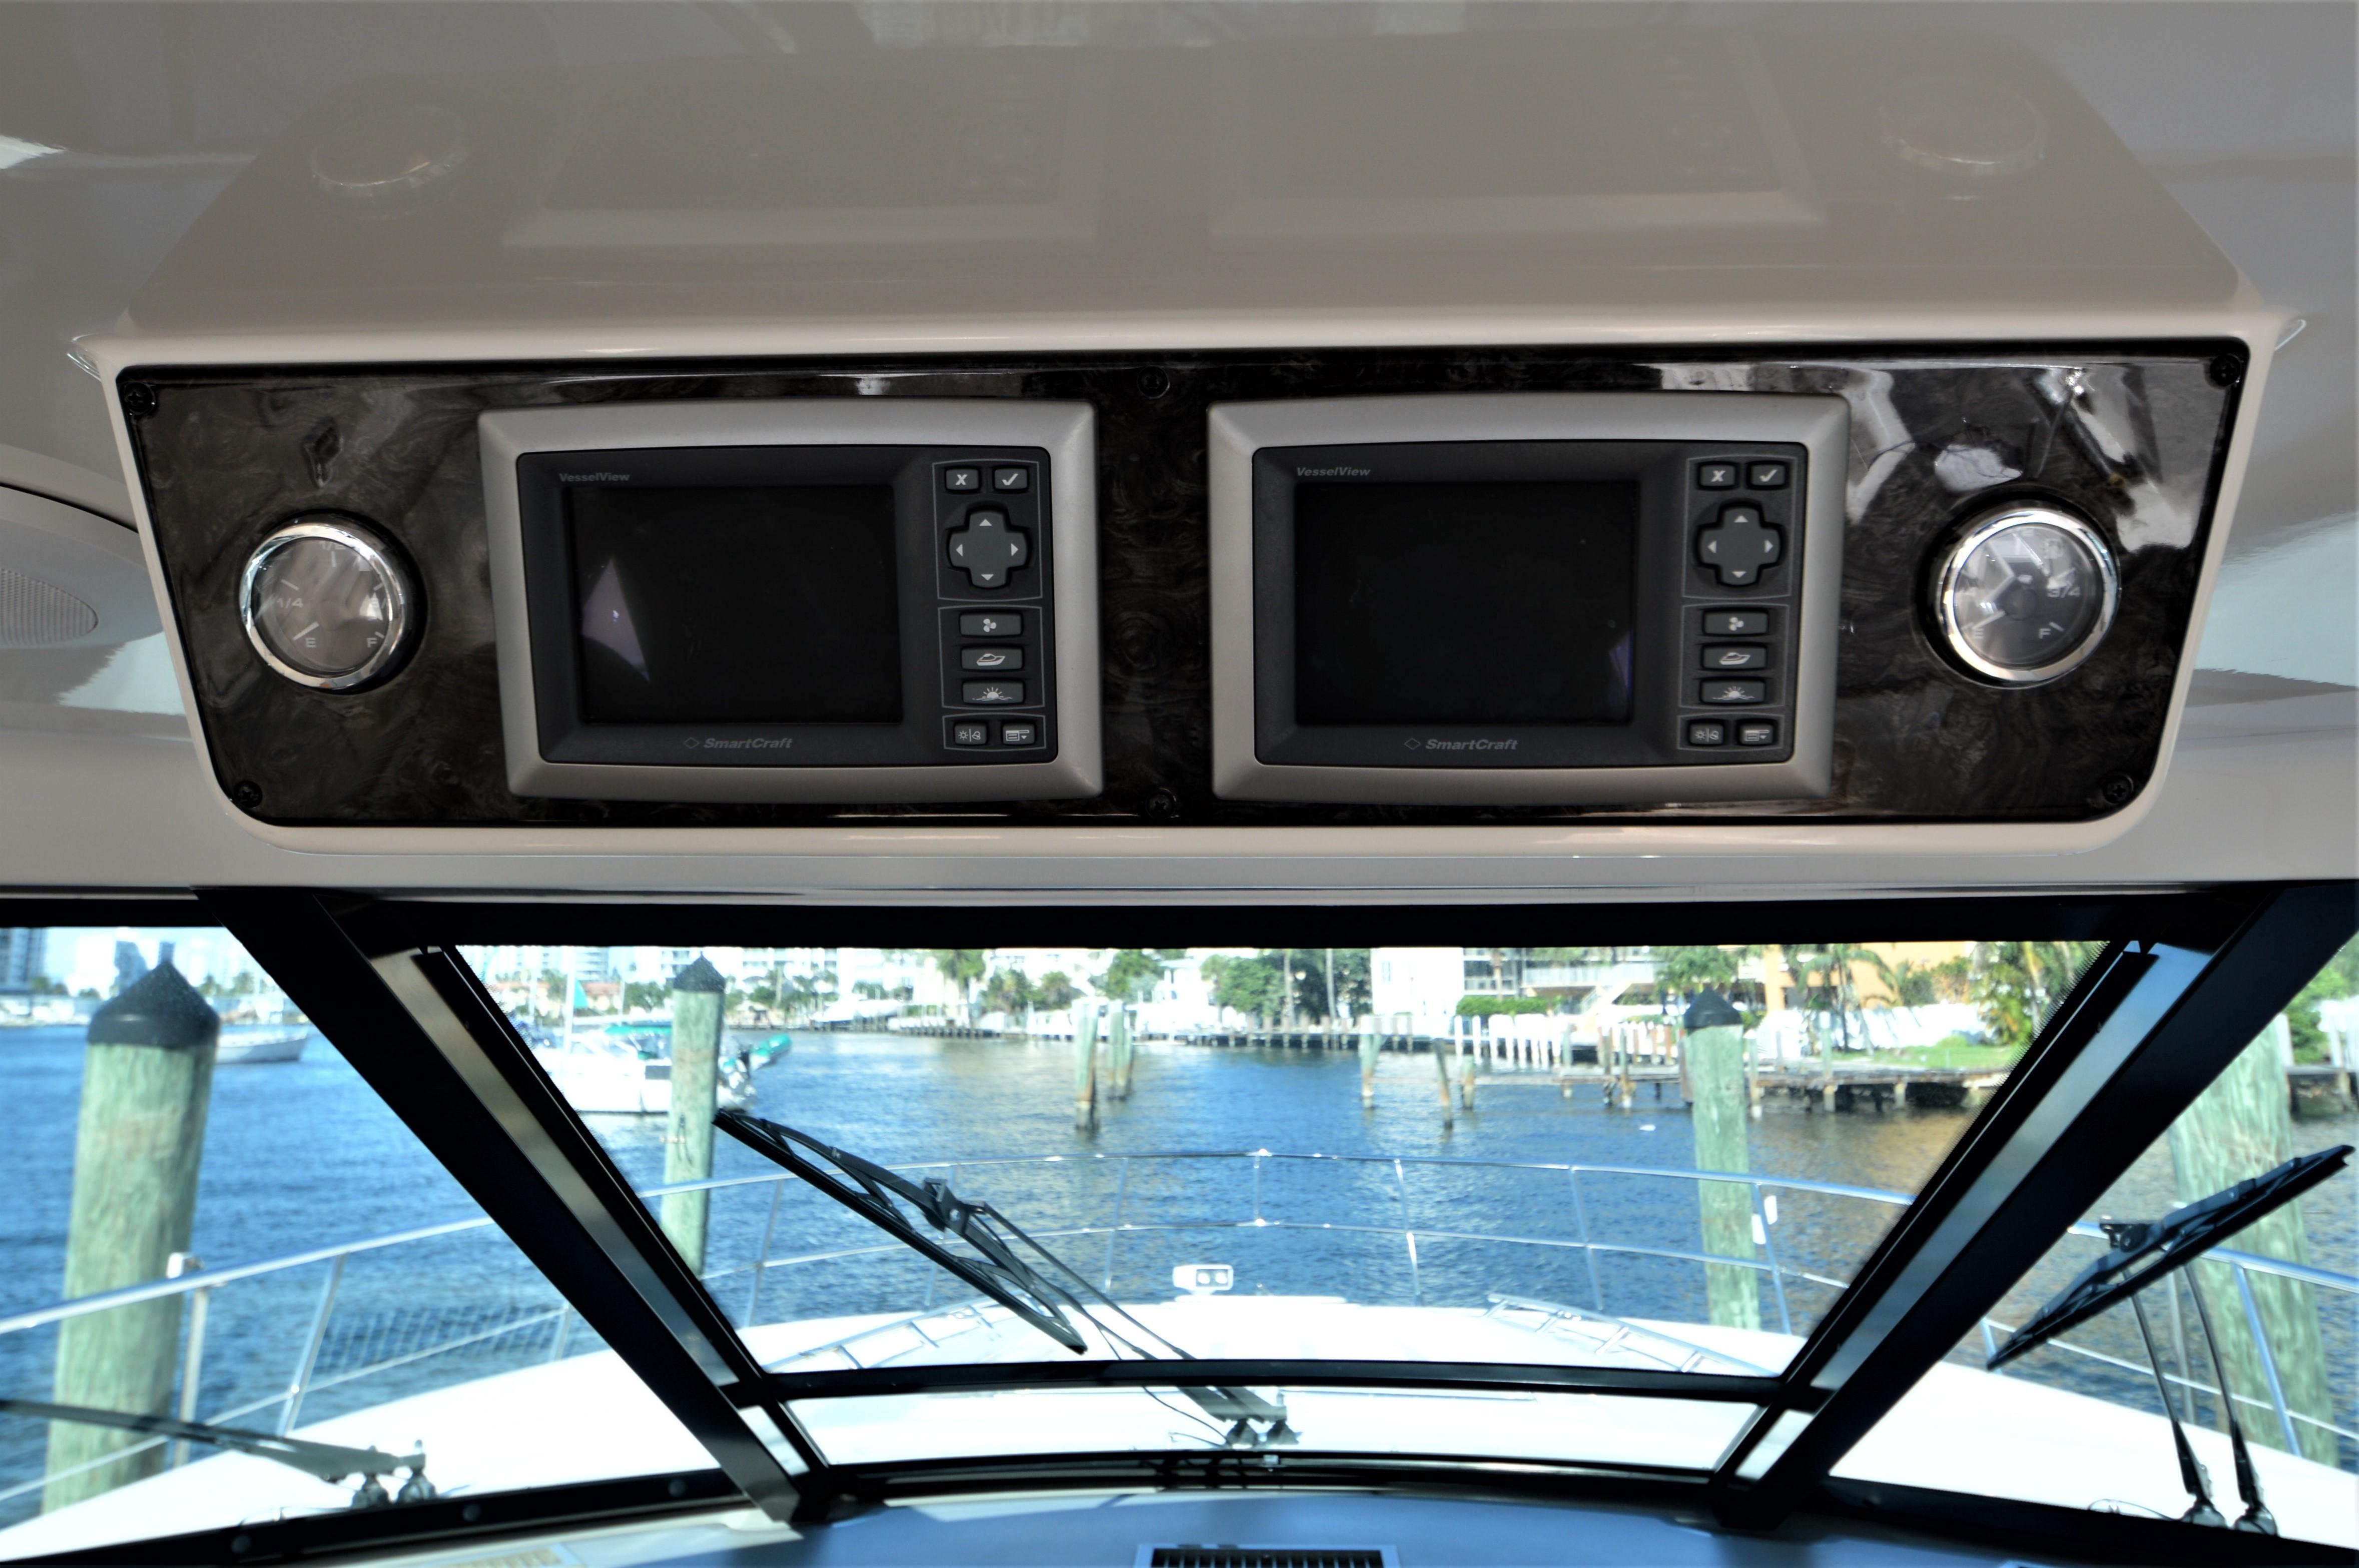 2012 Sea Ray 540 Lazy Blum - Engine Monitors